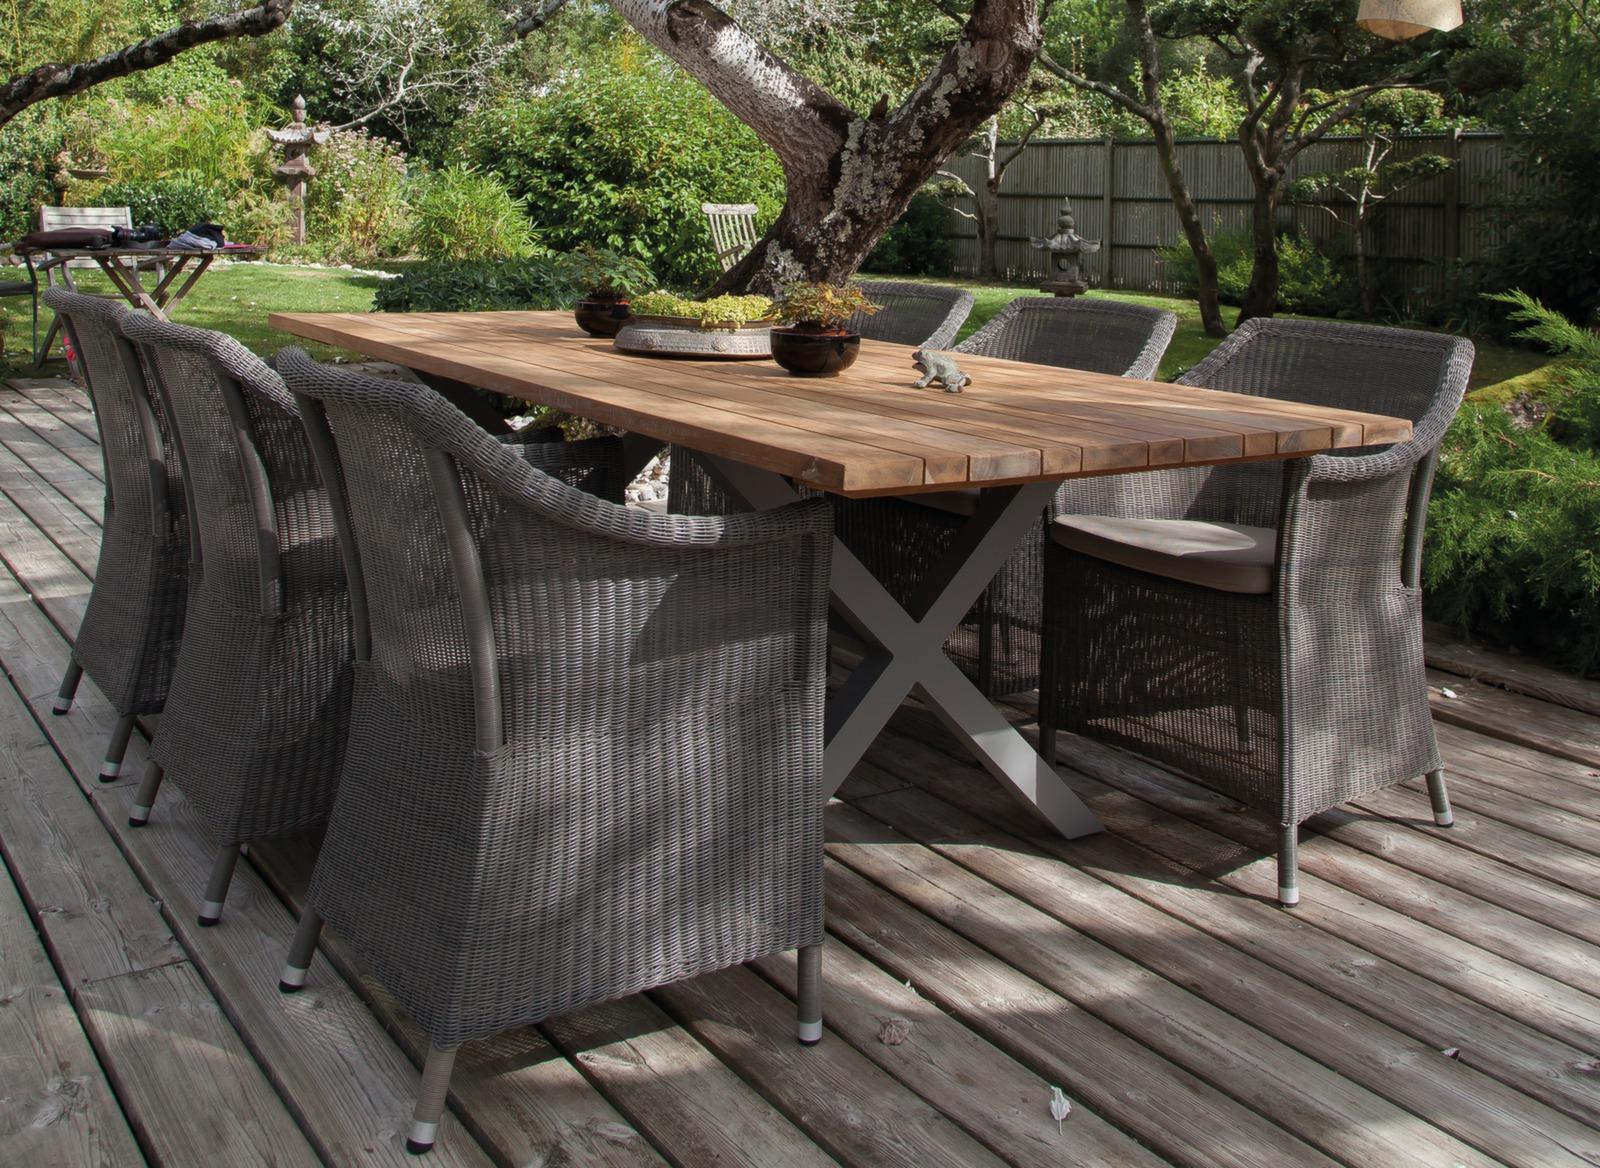 HOUSSE PROTECTION POUR TABLE 220x100 POLYESTER/PVC - GRIS